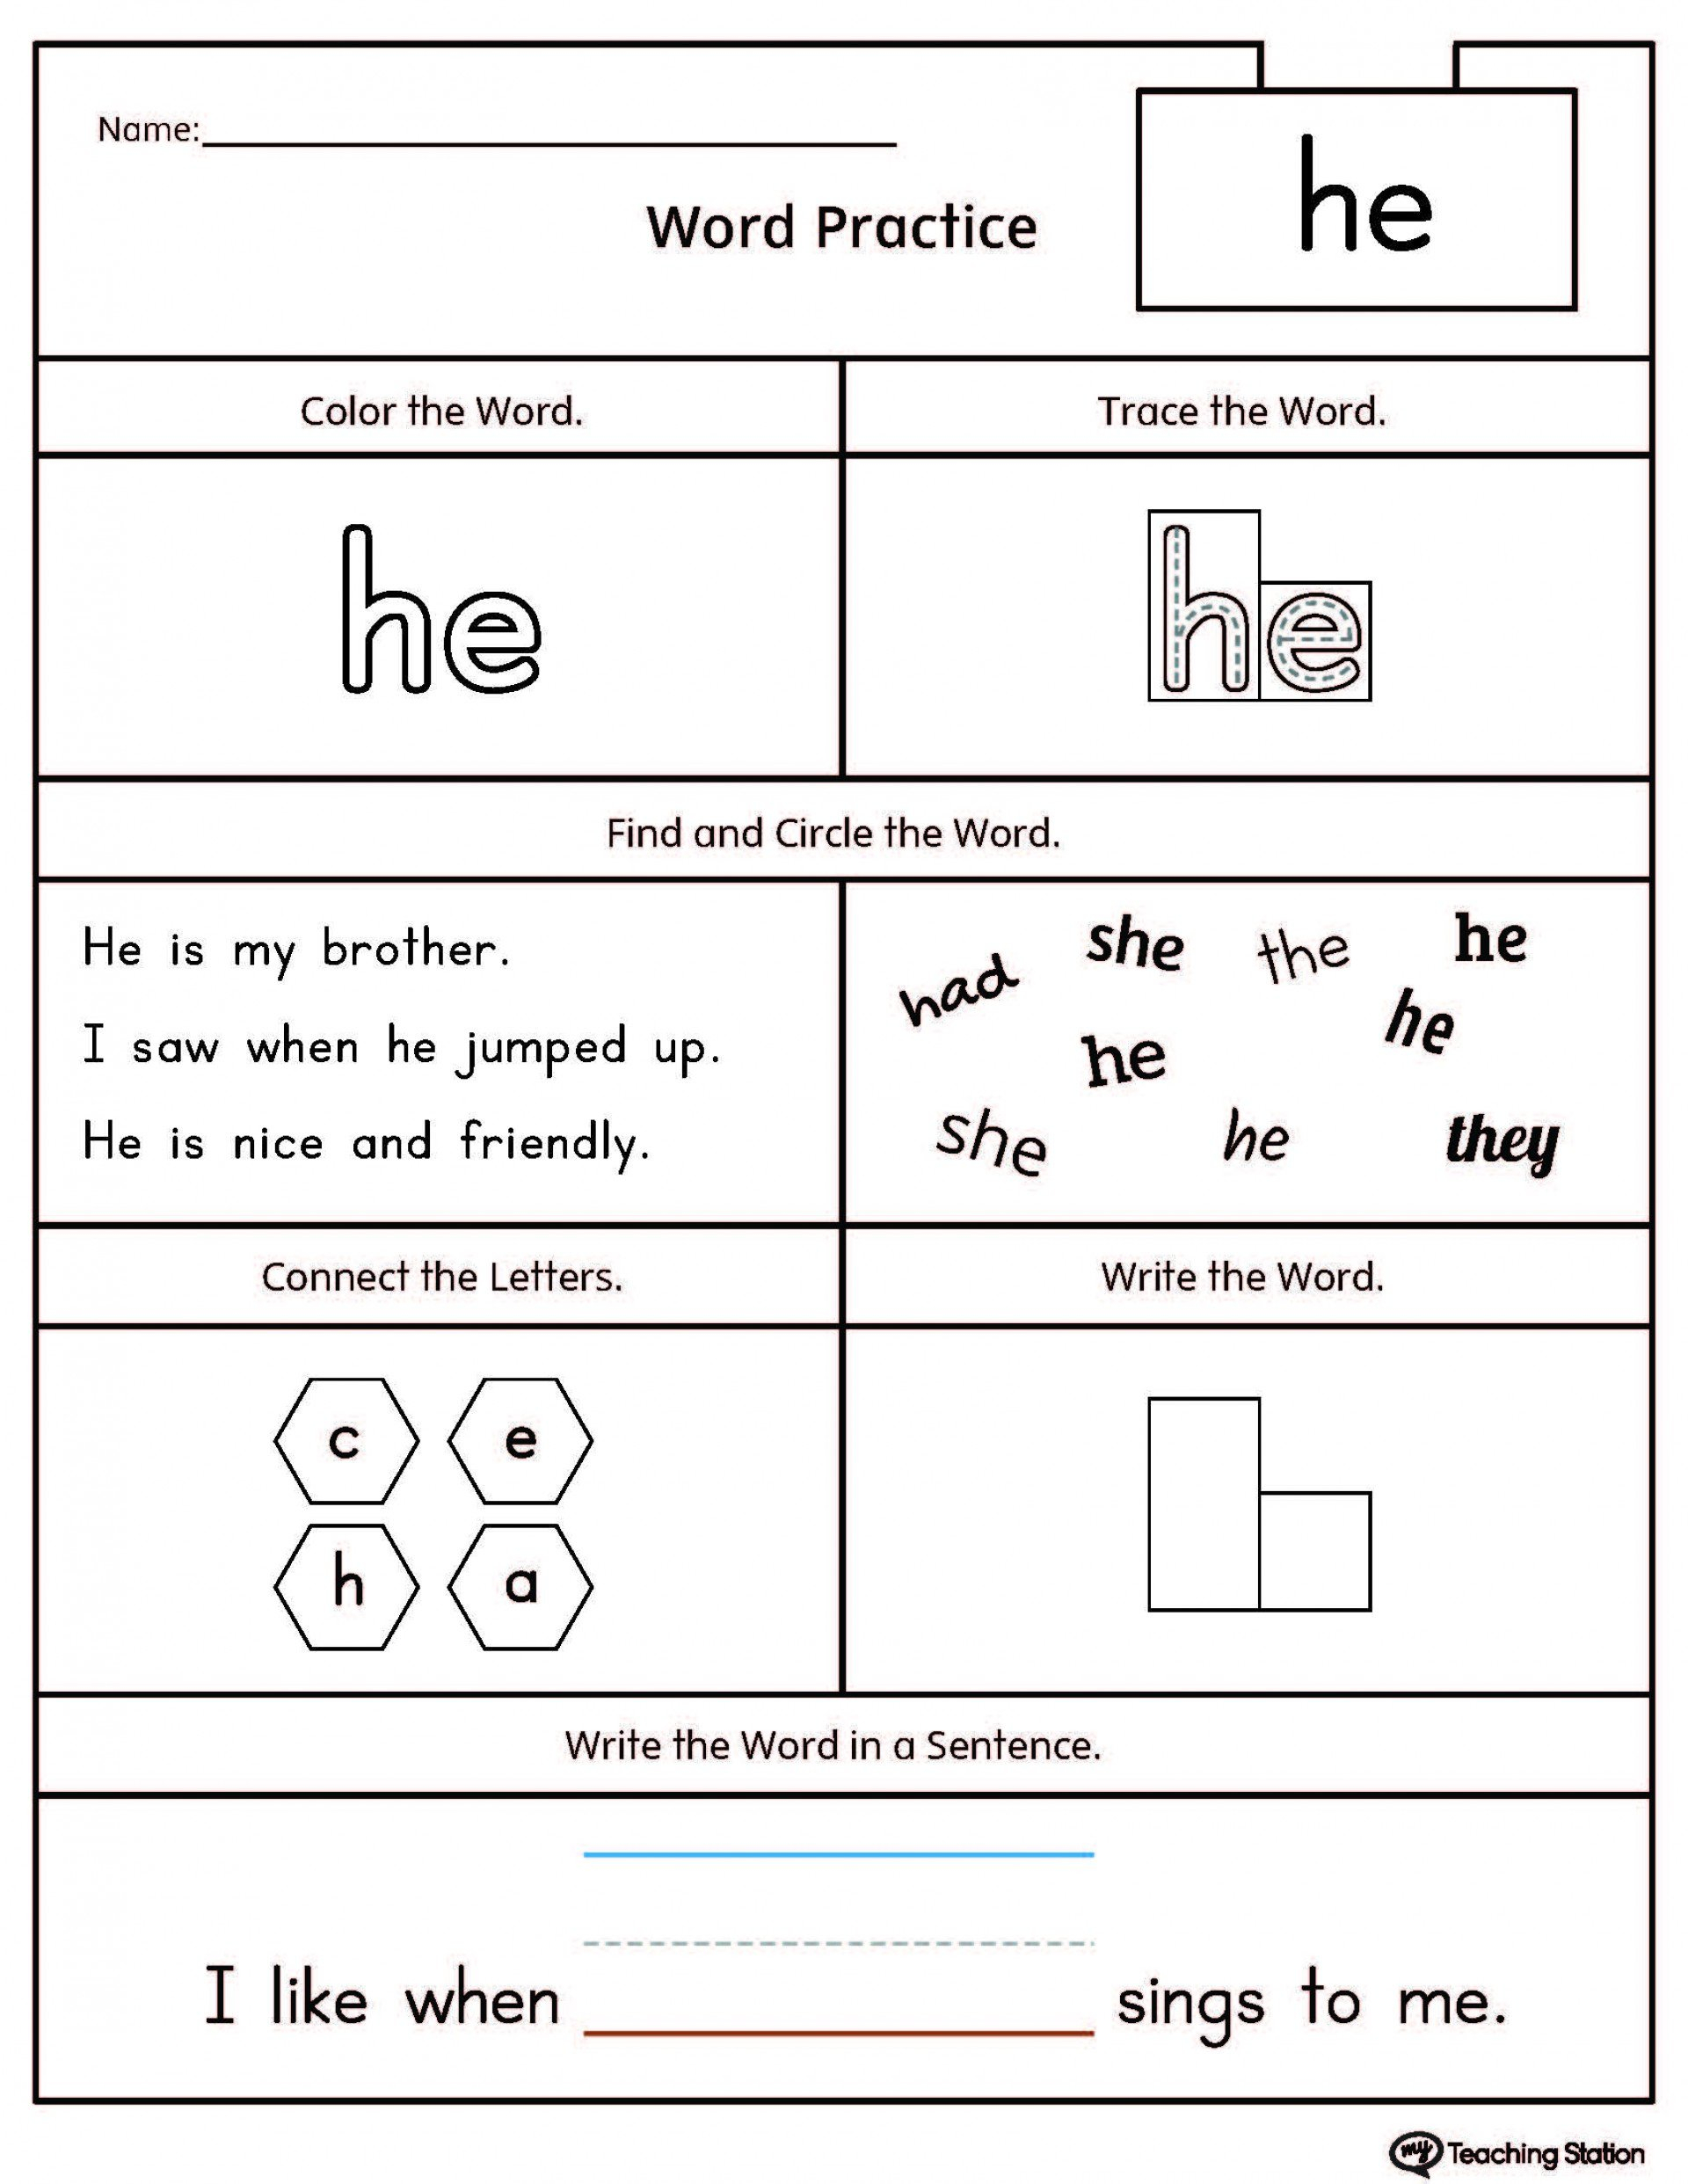 011 Printable Word Kindergarten Site Wonderful Words Sight List Pdf With Brain Teasers Worksheets Pdf